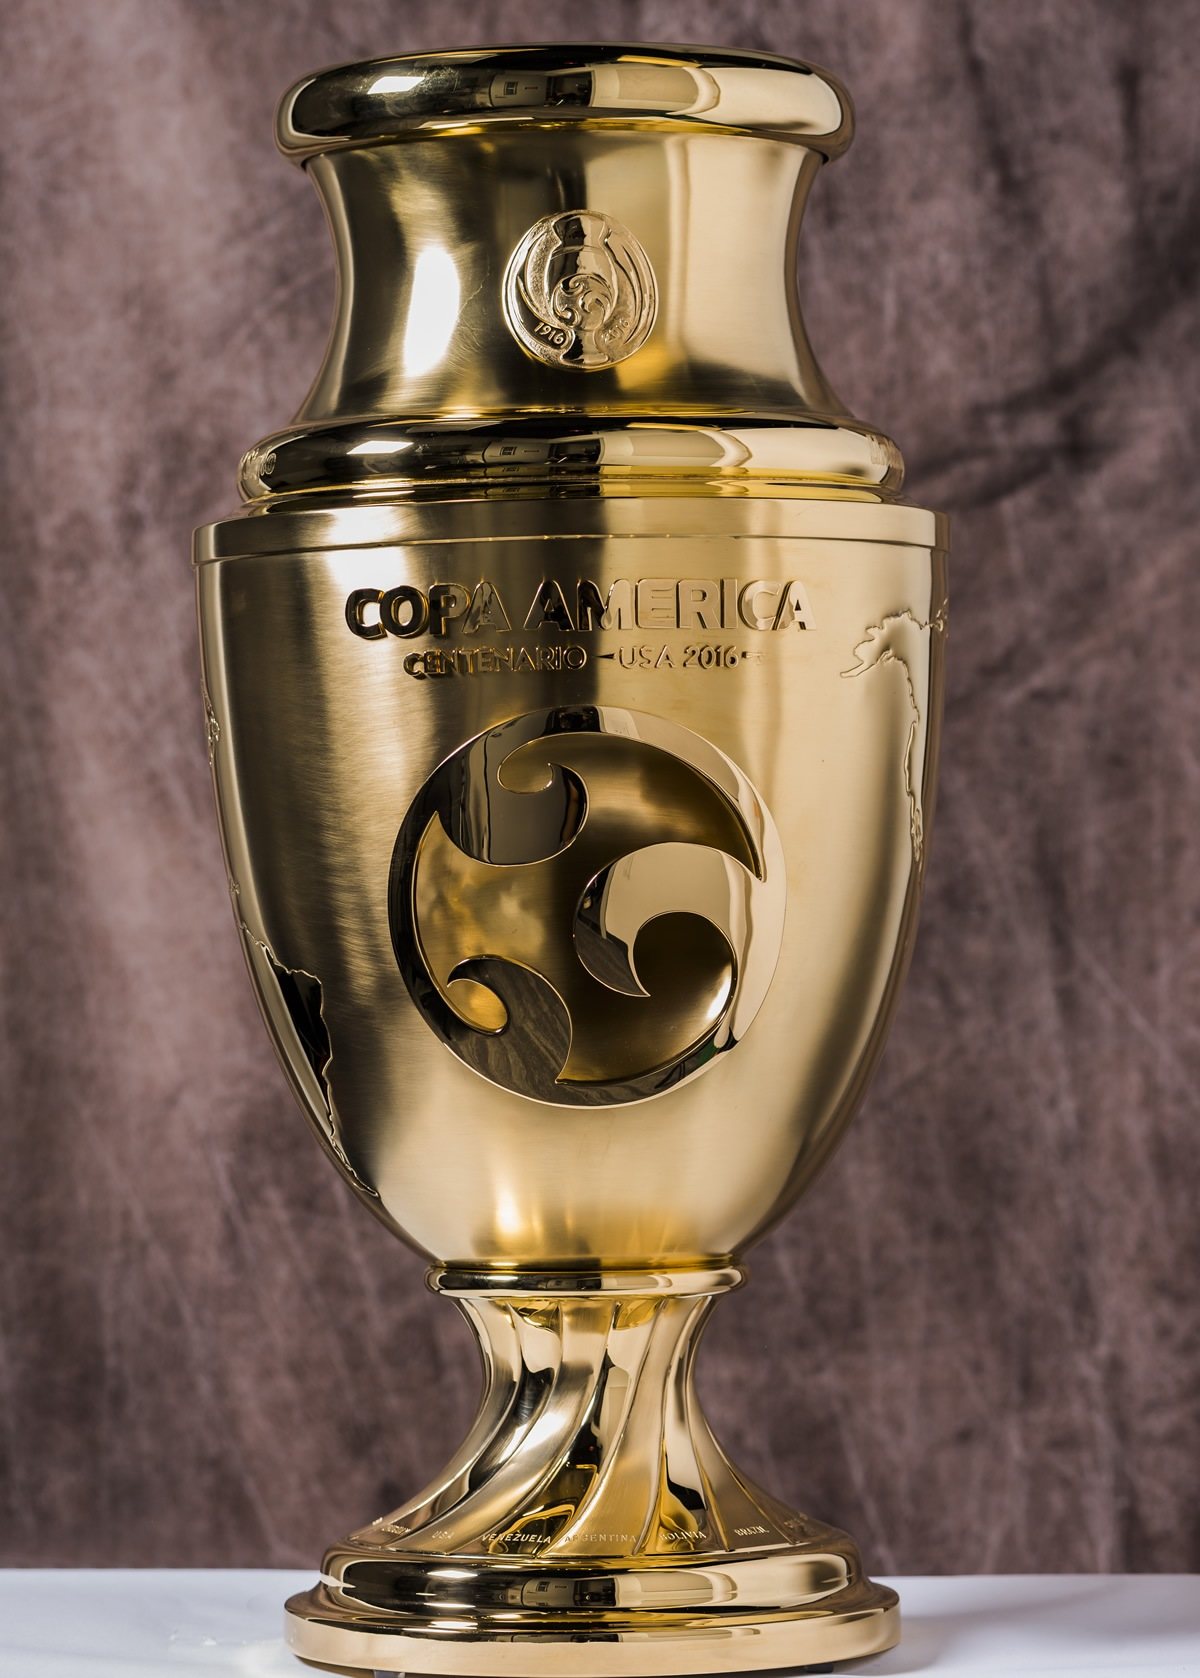 Copa Americ